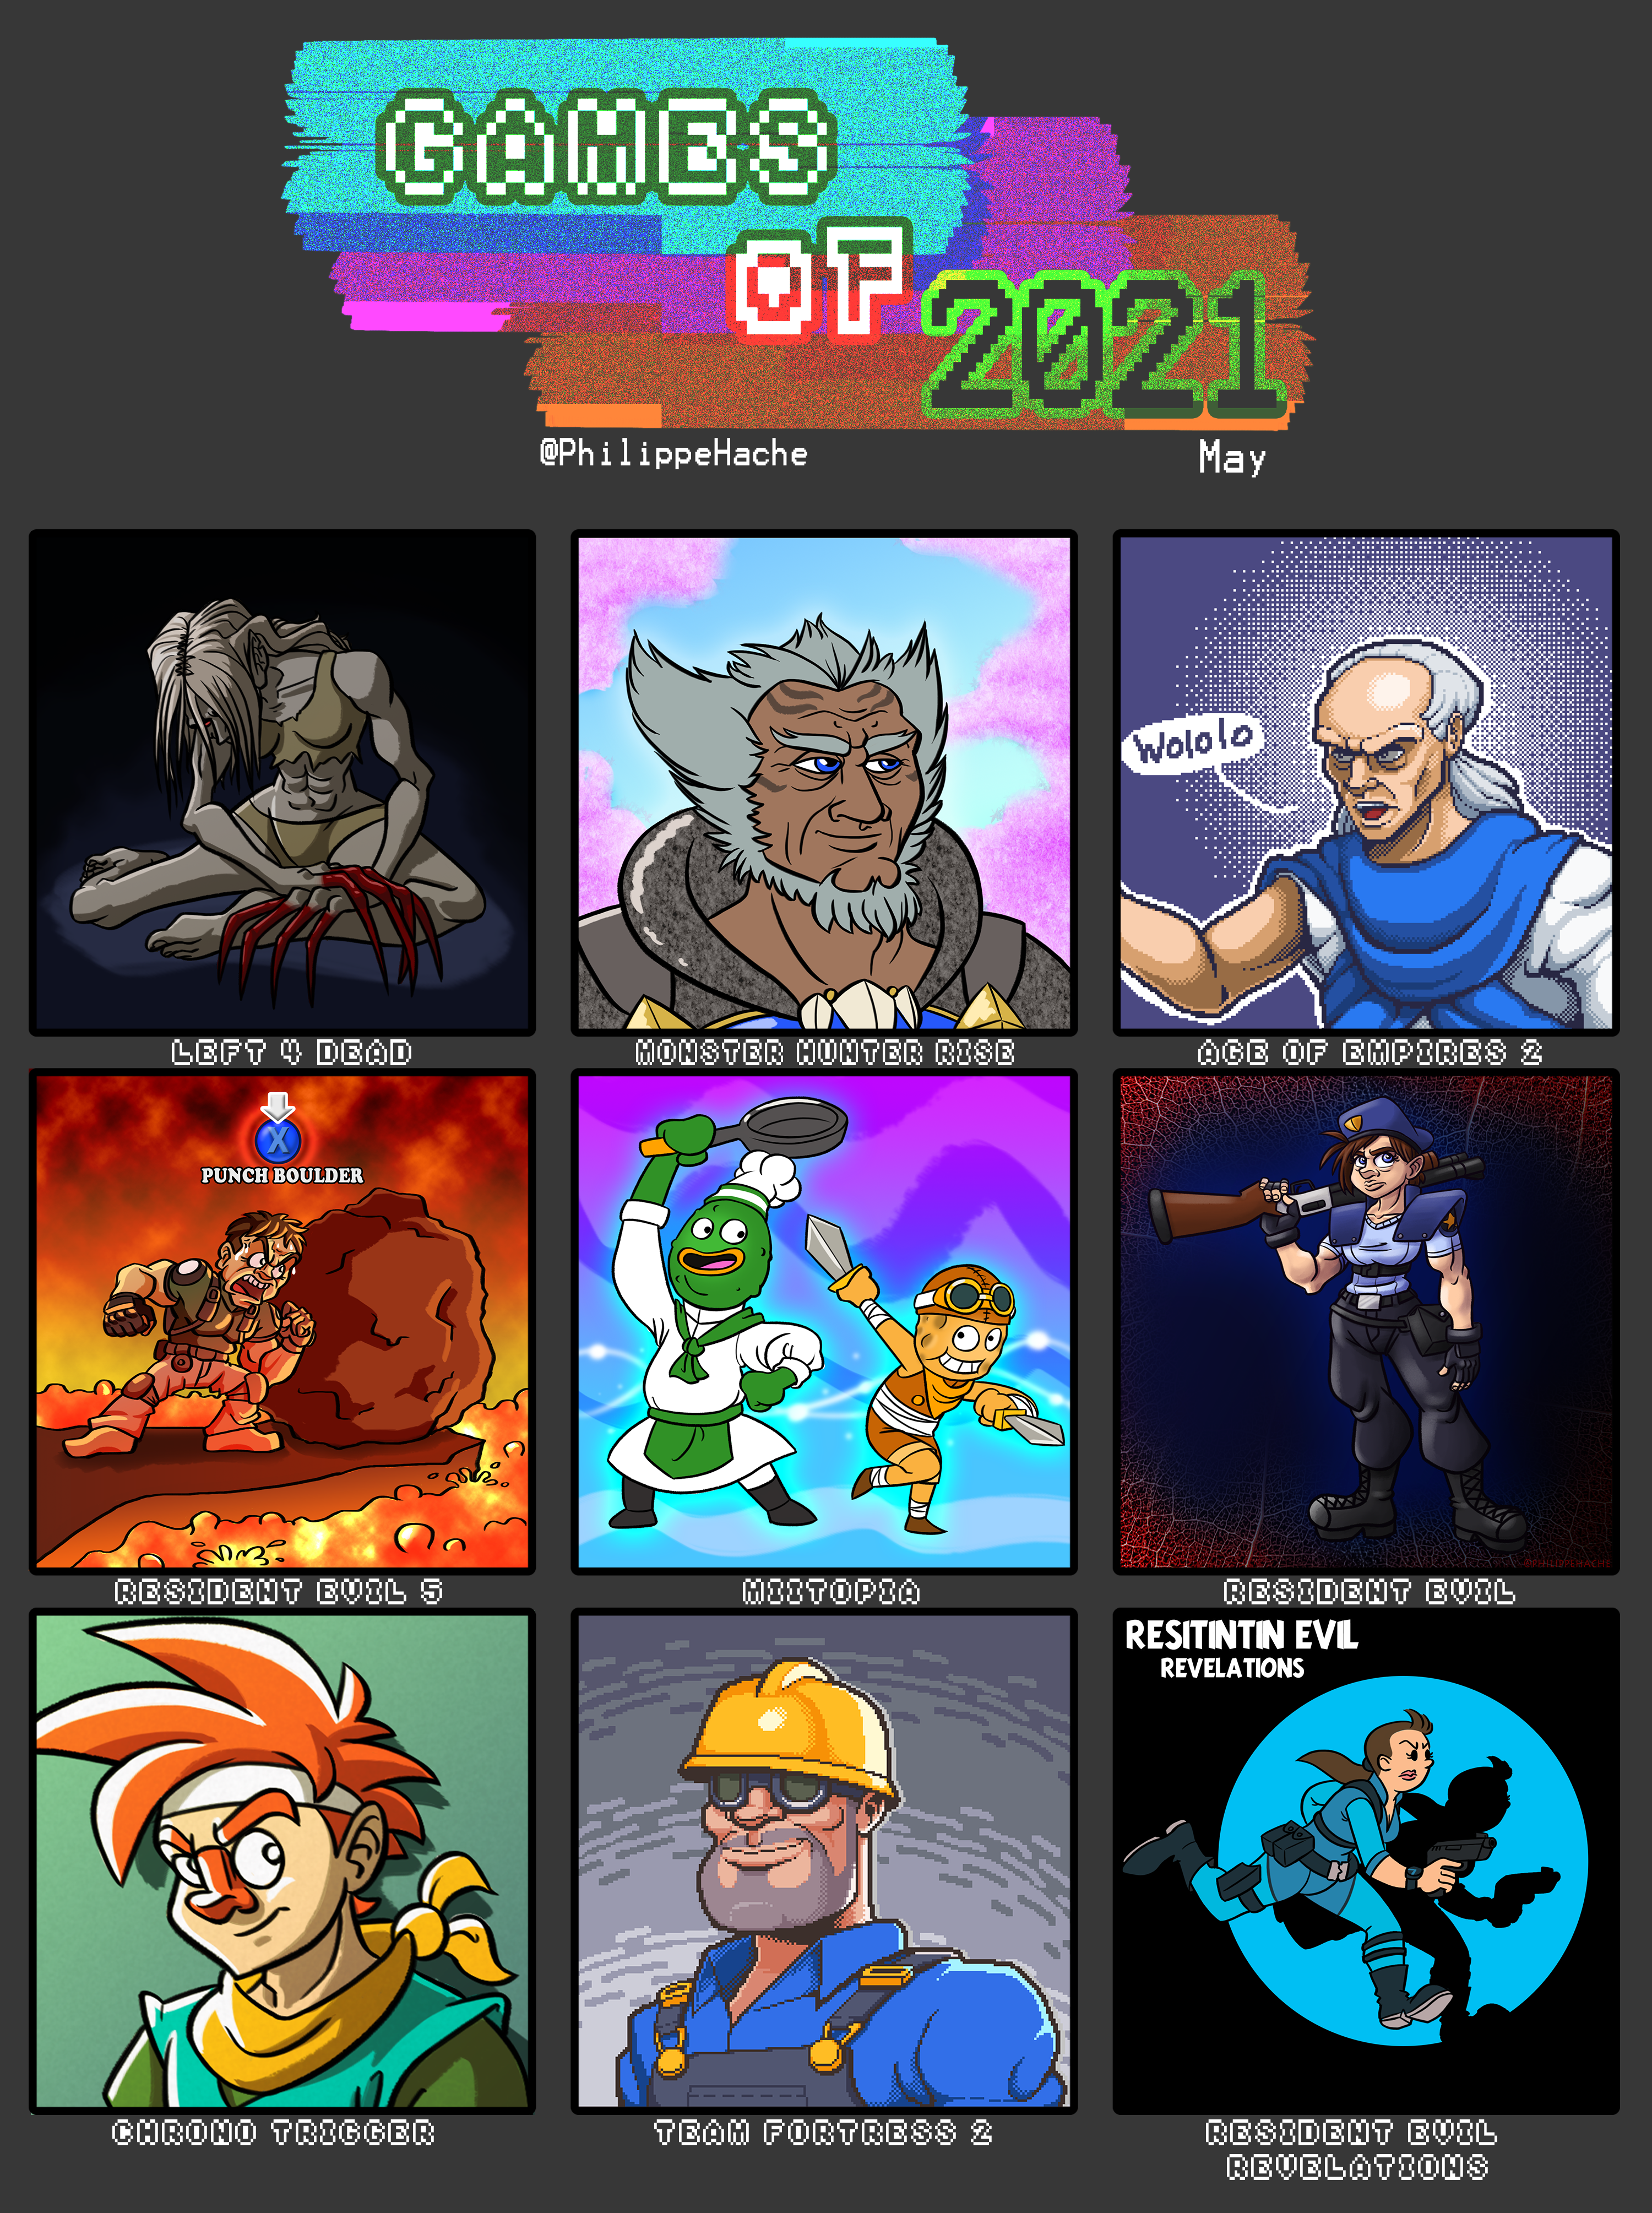 Games of 2021 #05 May